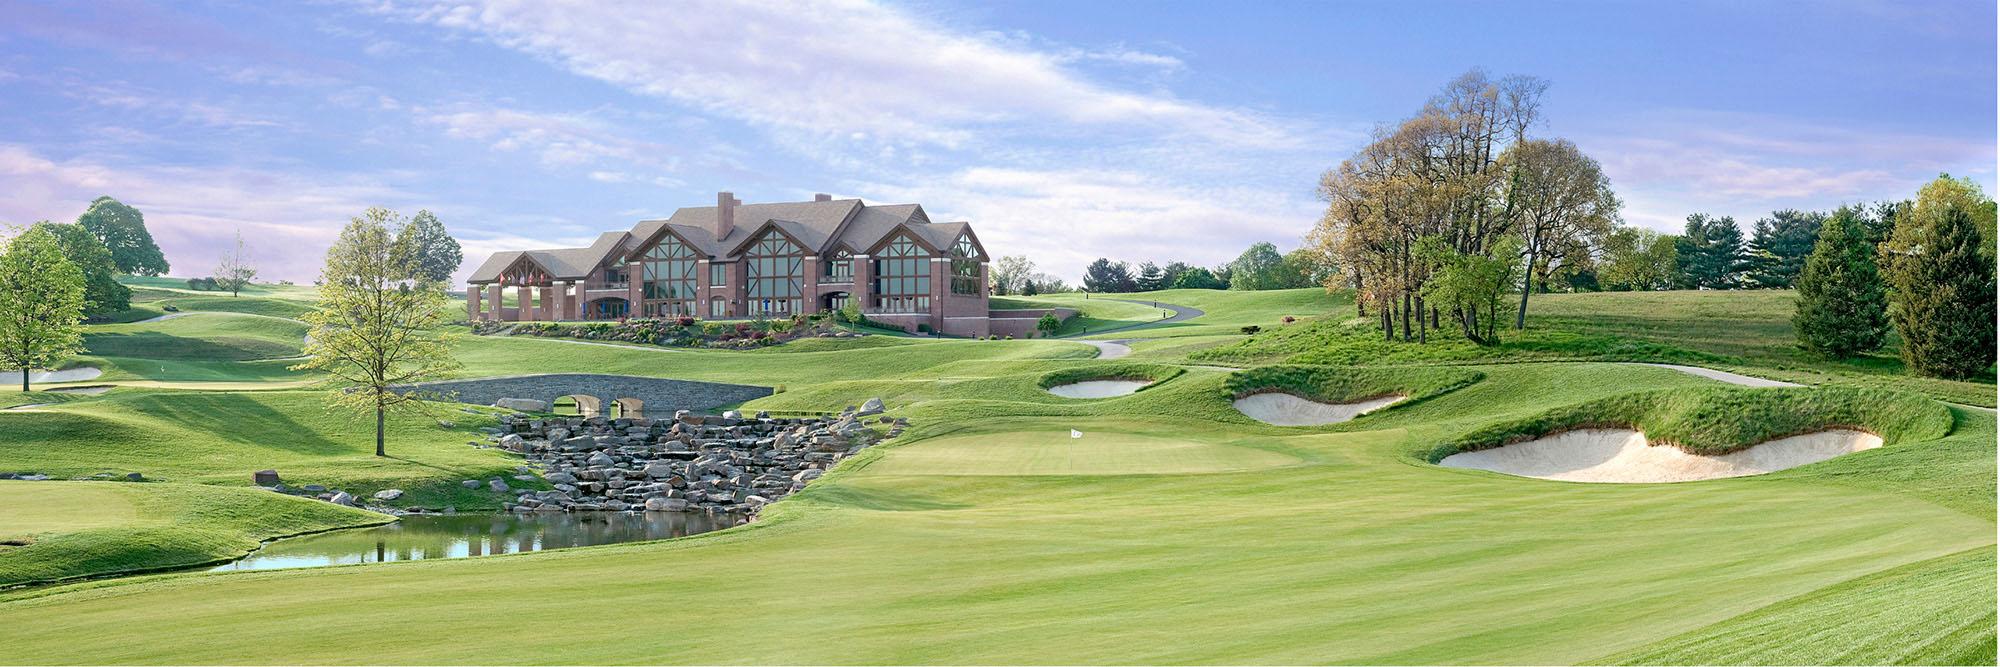 Golf Course Image - The ACE Club No. 9